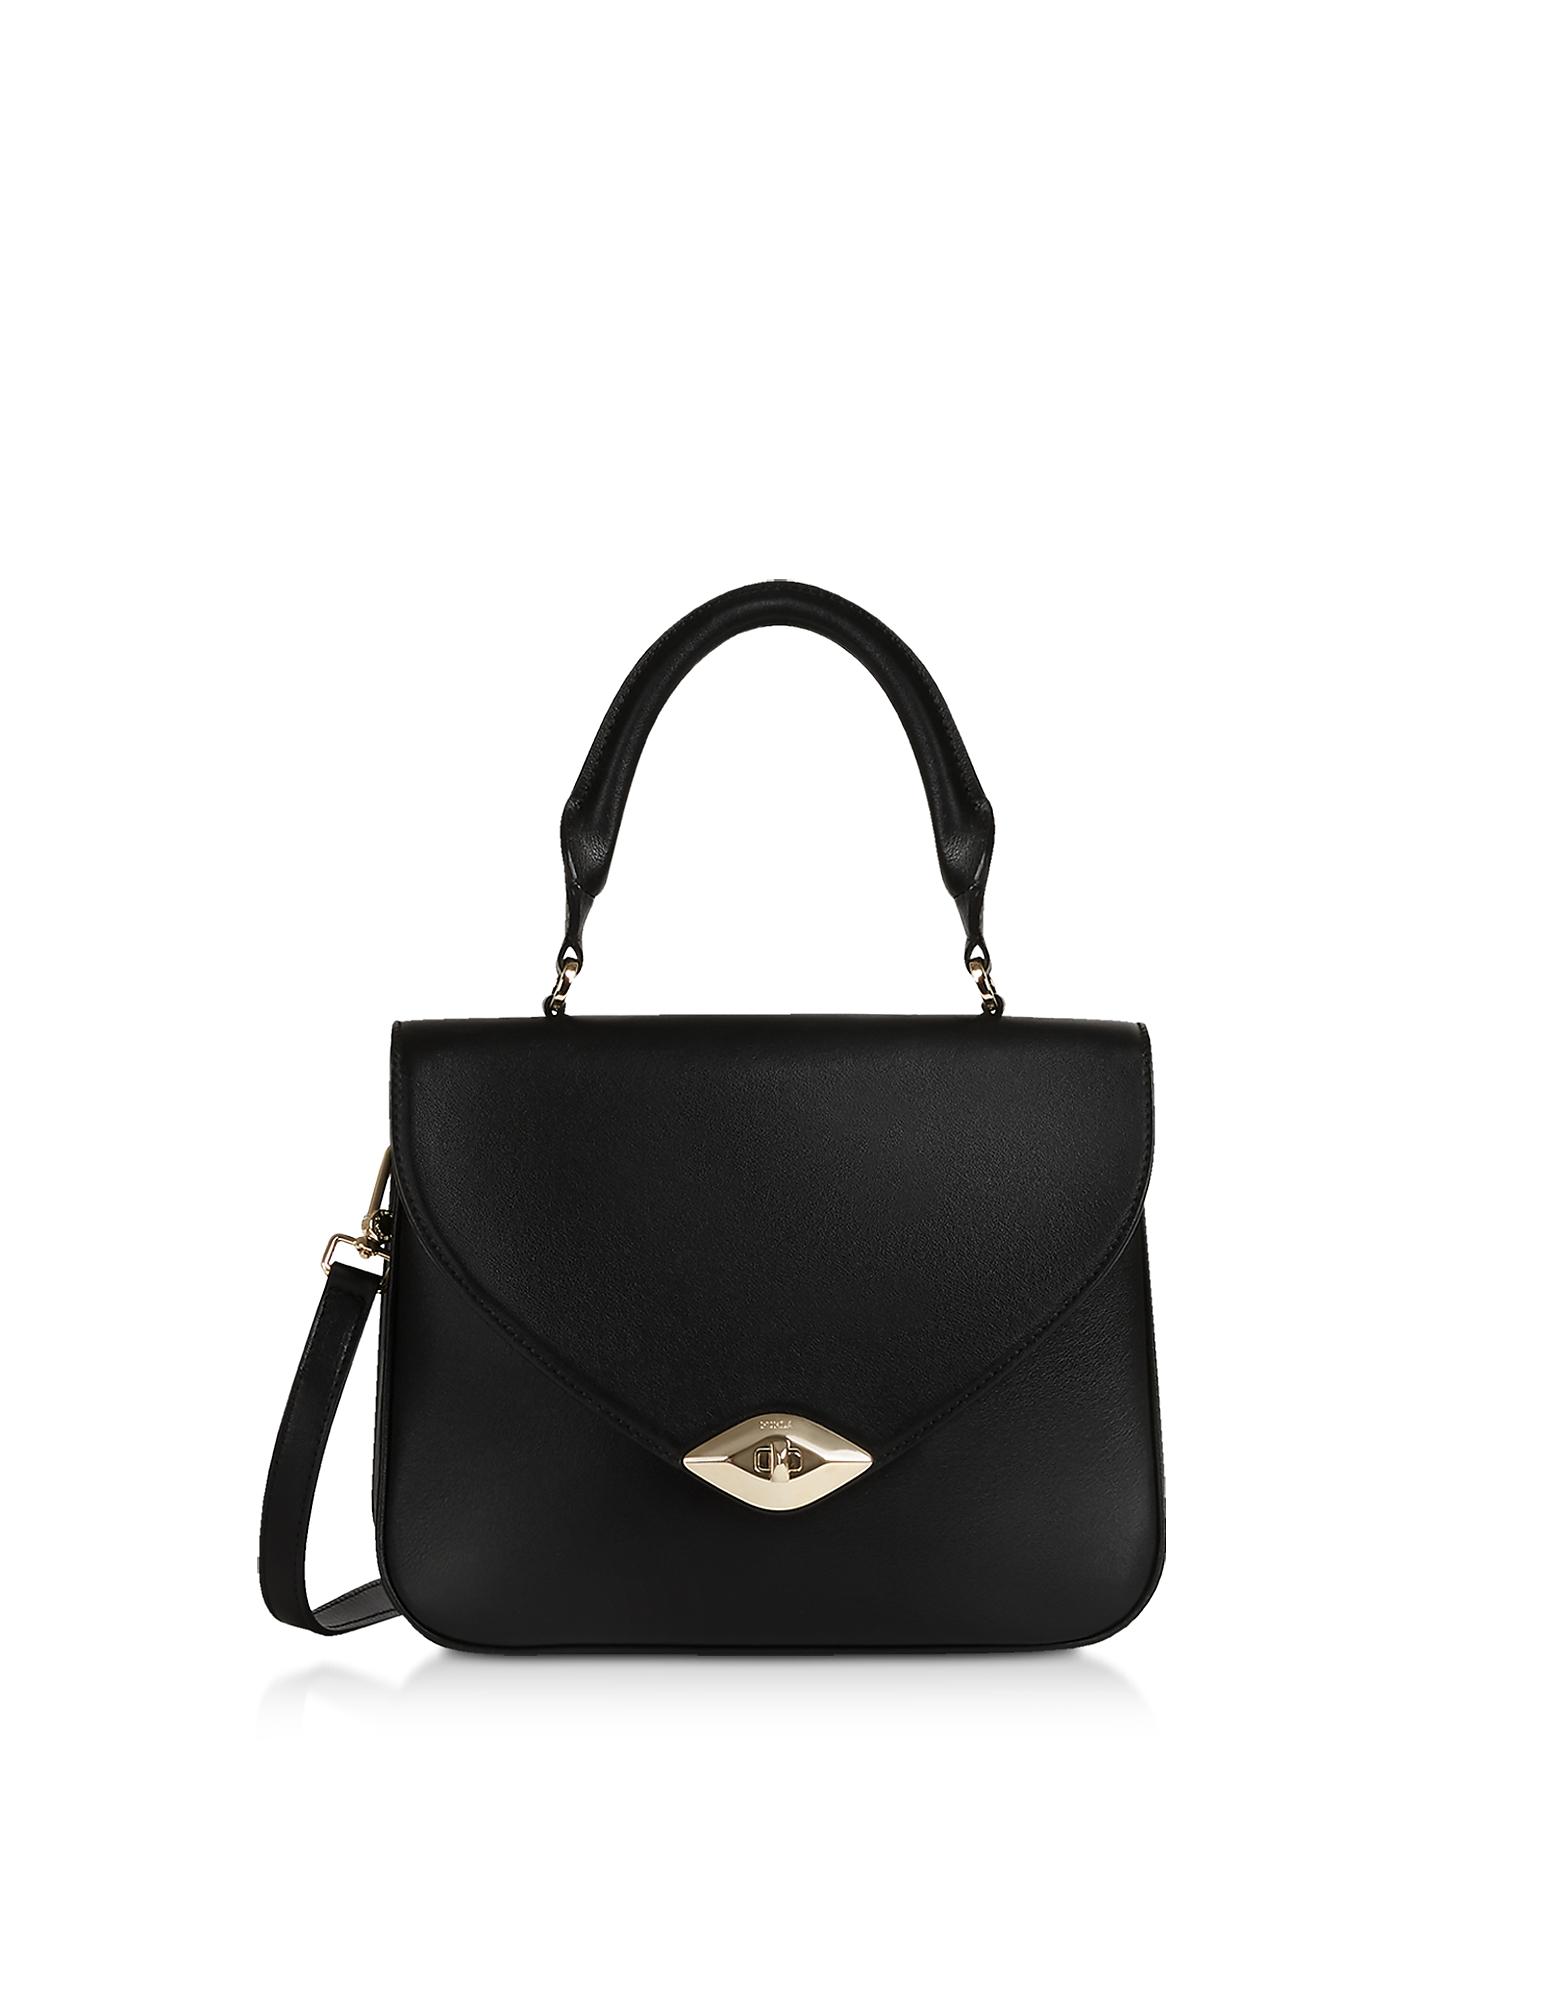 Furla Designer Handbags, Eye S Top Handle bag